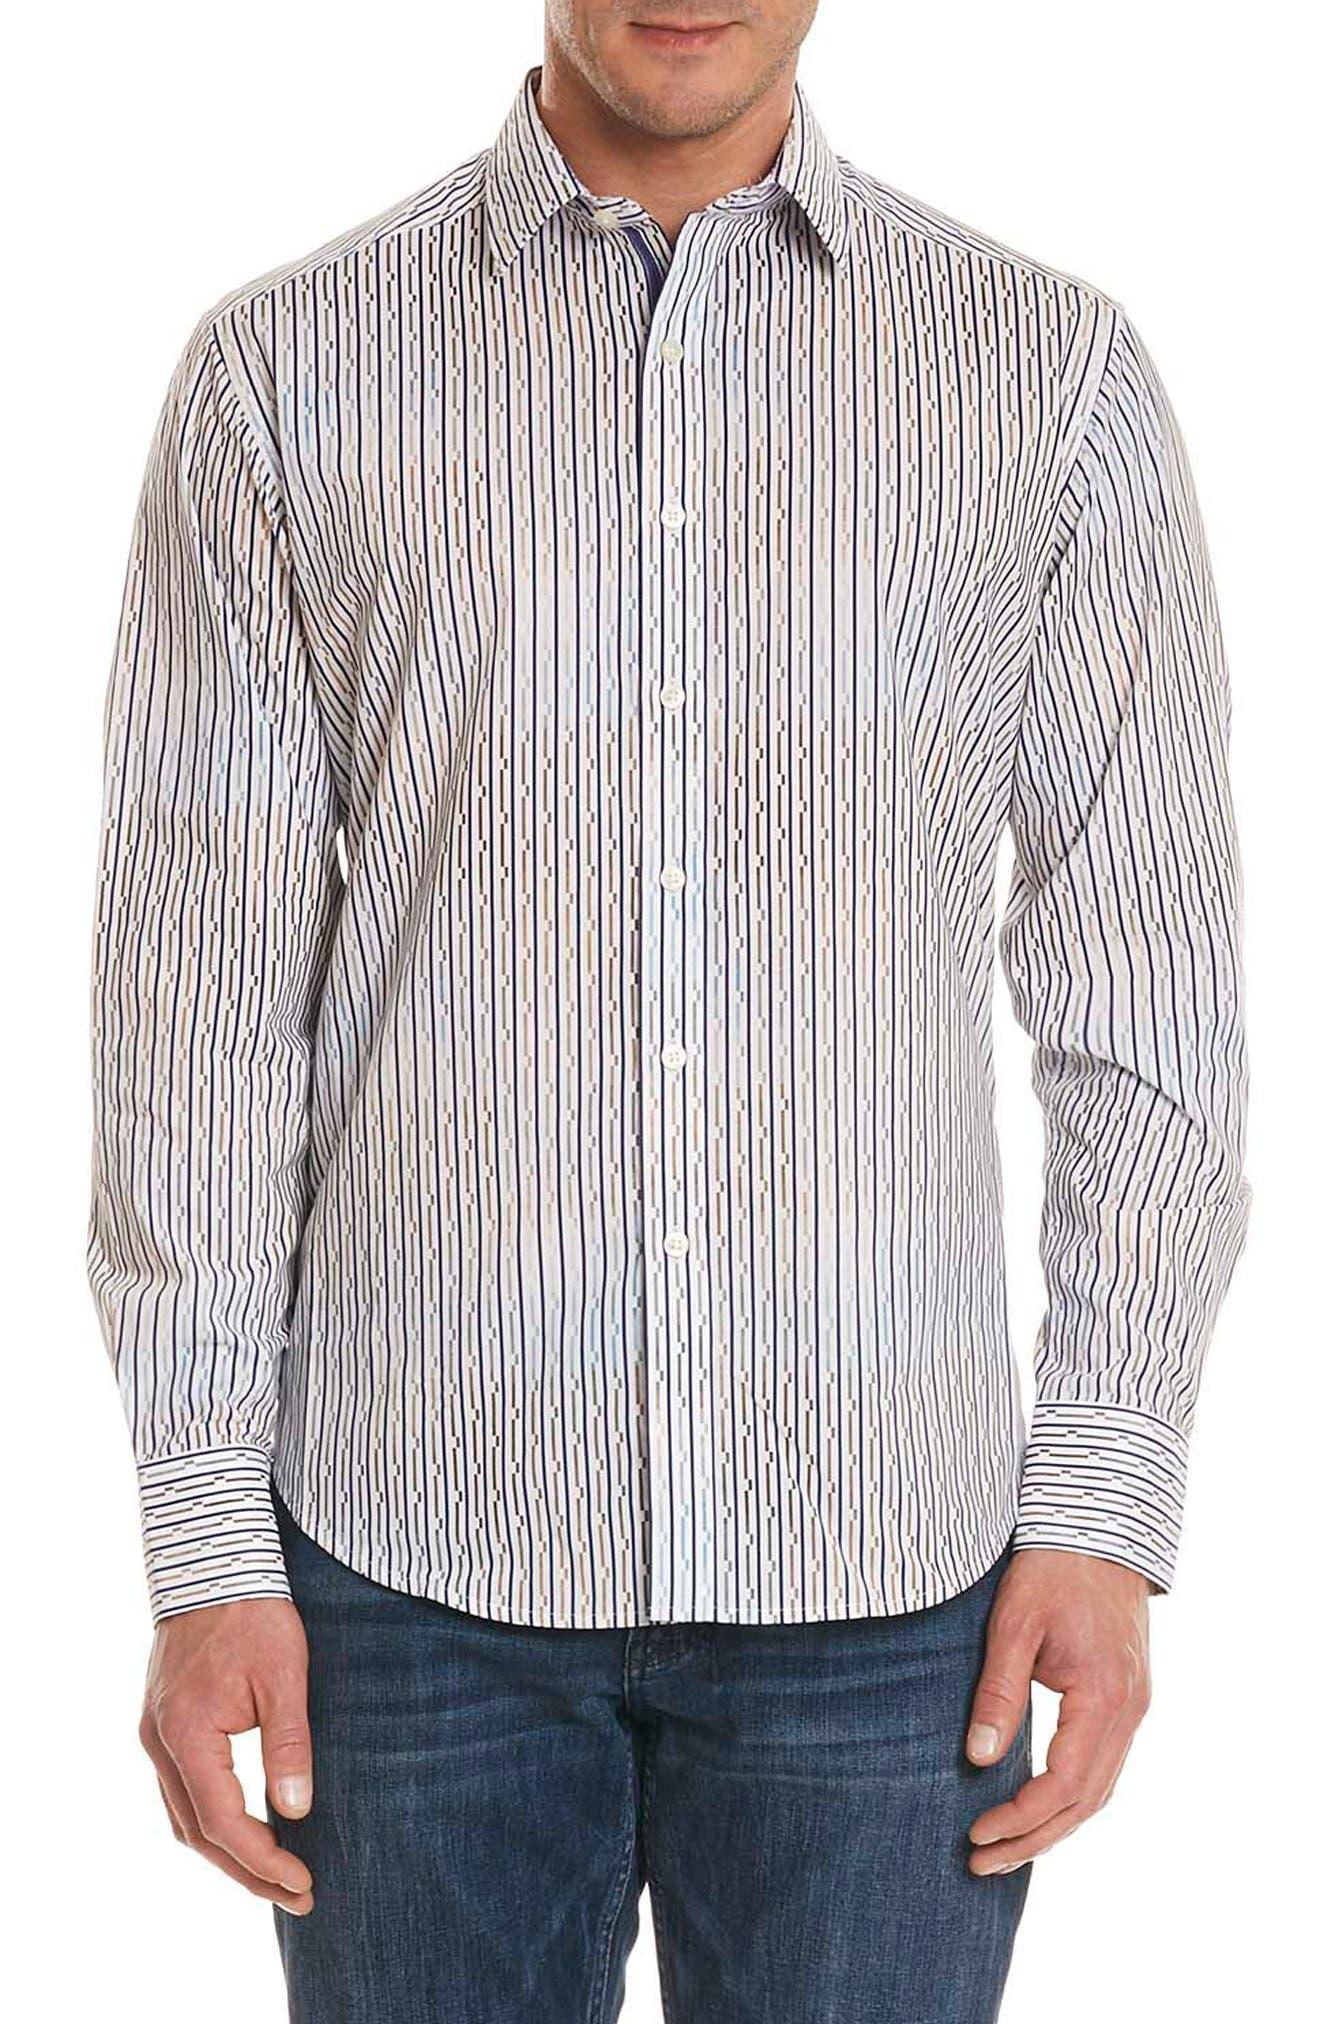 Trinidad Classic Fit Sport Shirt,                         Main,                         color, Multi